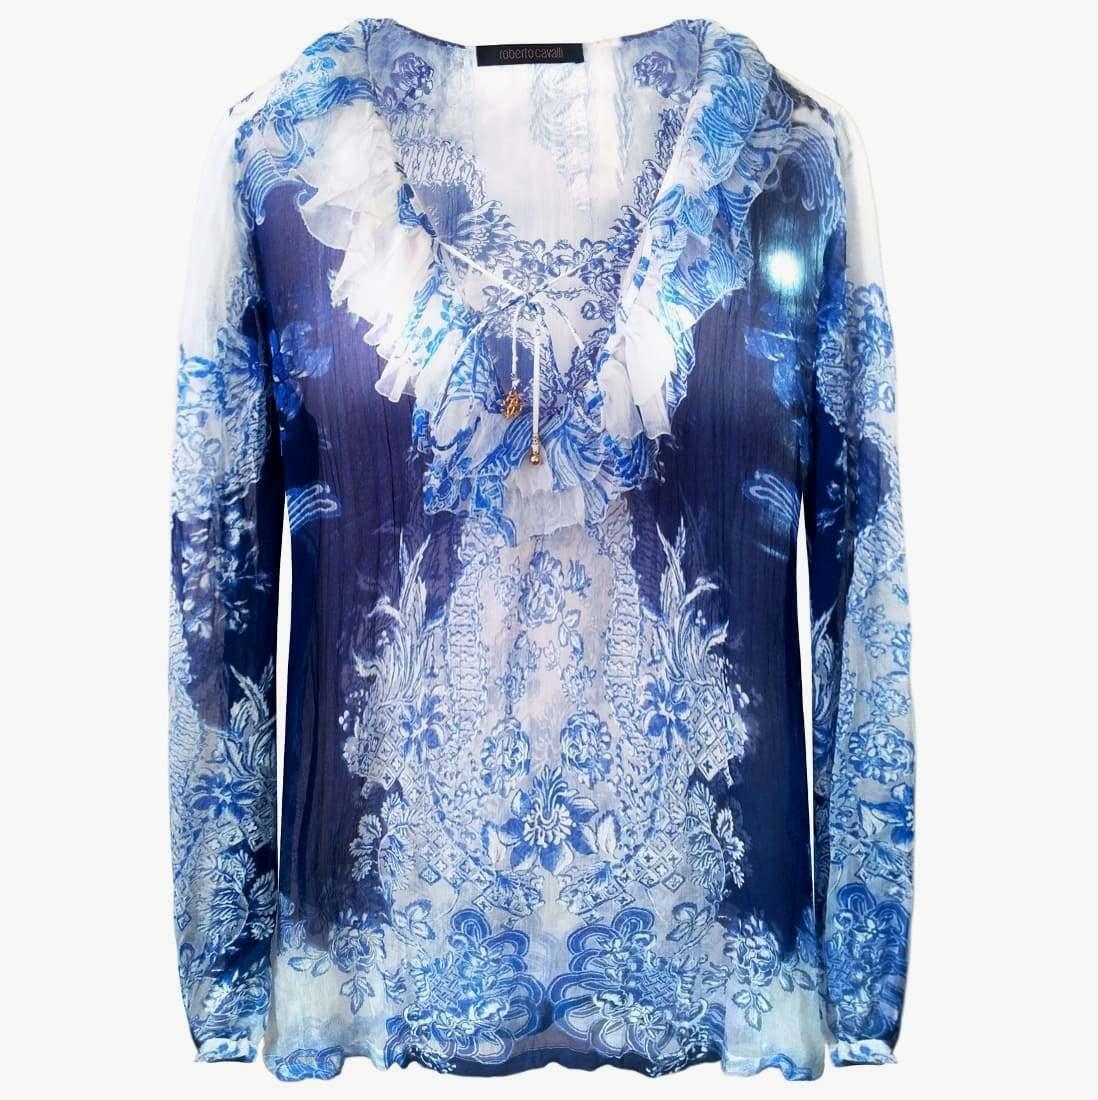 ROBERTO CAVALLI Women Silk Blouse Size 2XL Womens Oversize Blouse bluee Flower